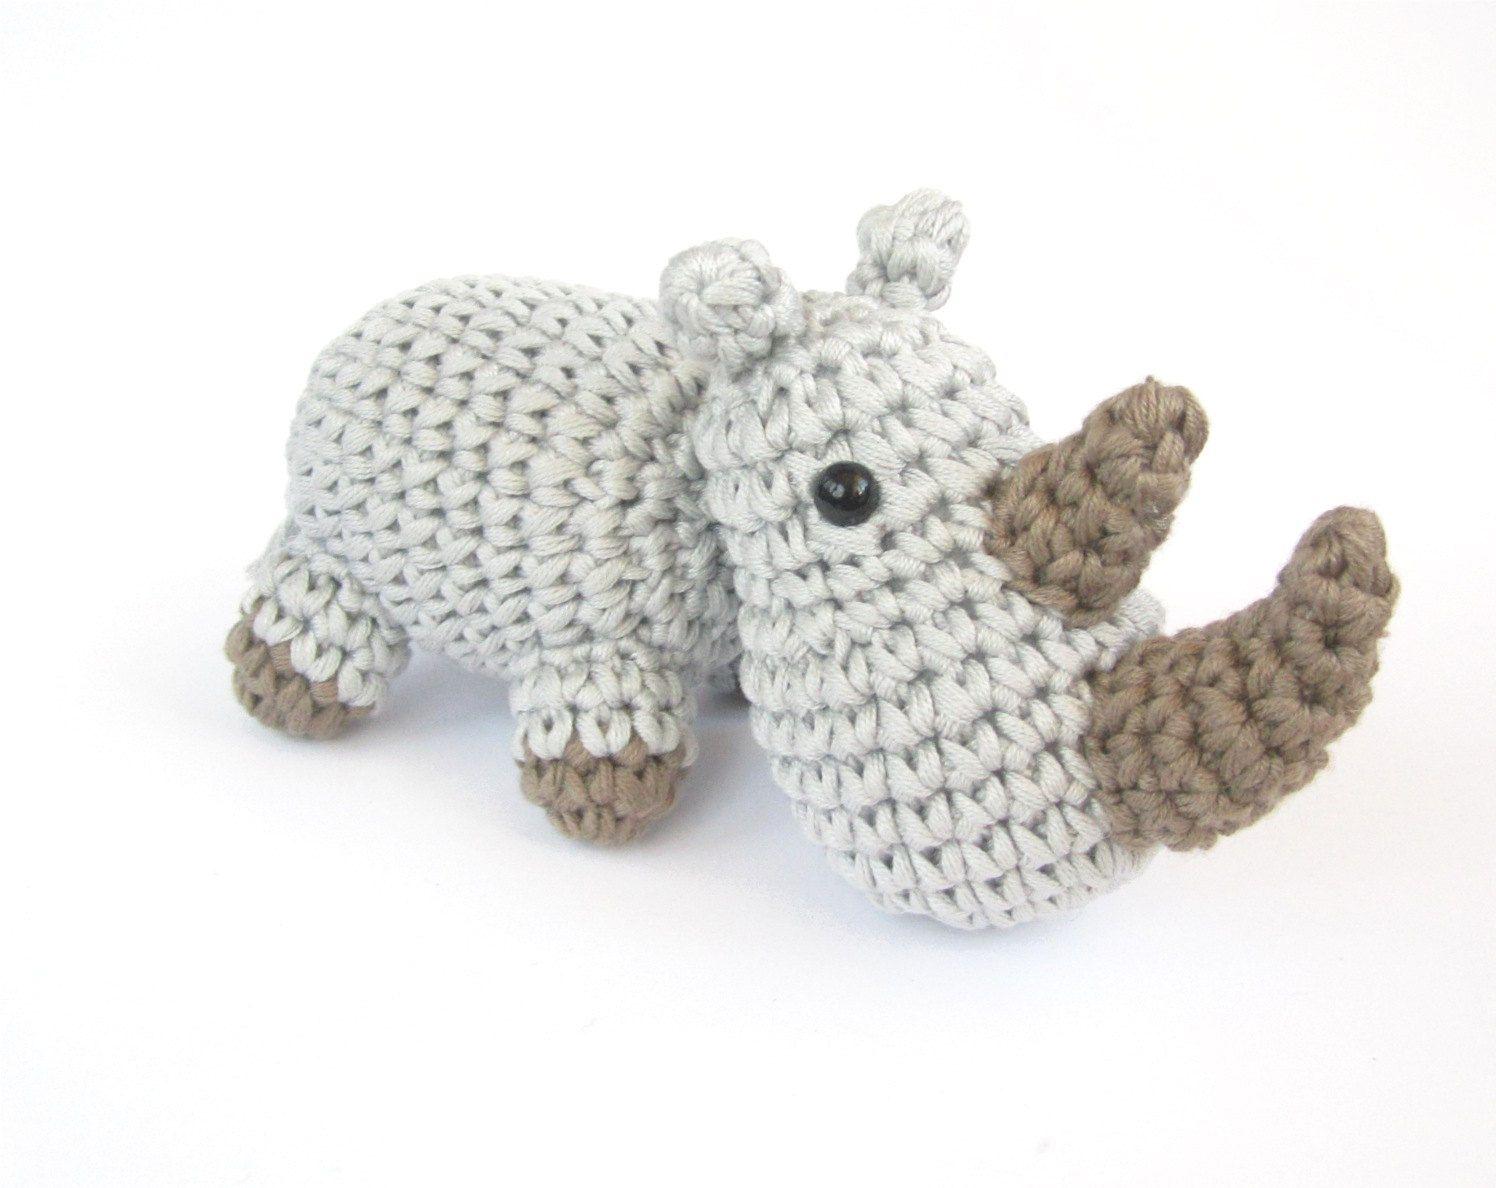 Amigurumi rhino PATTERN - Crochet TUTORIAL - Stuffed animal - Soft ...